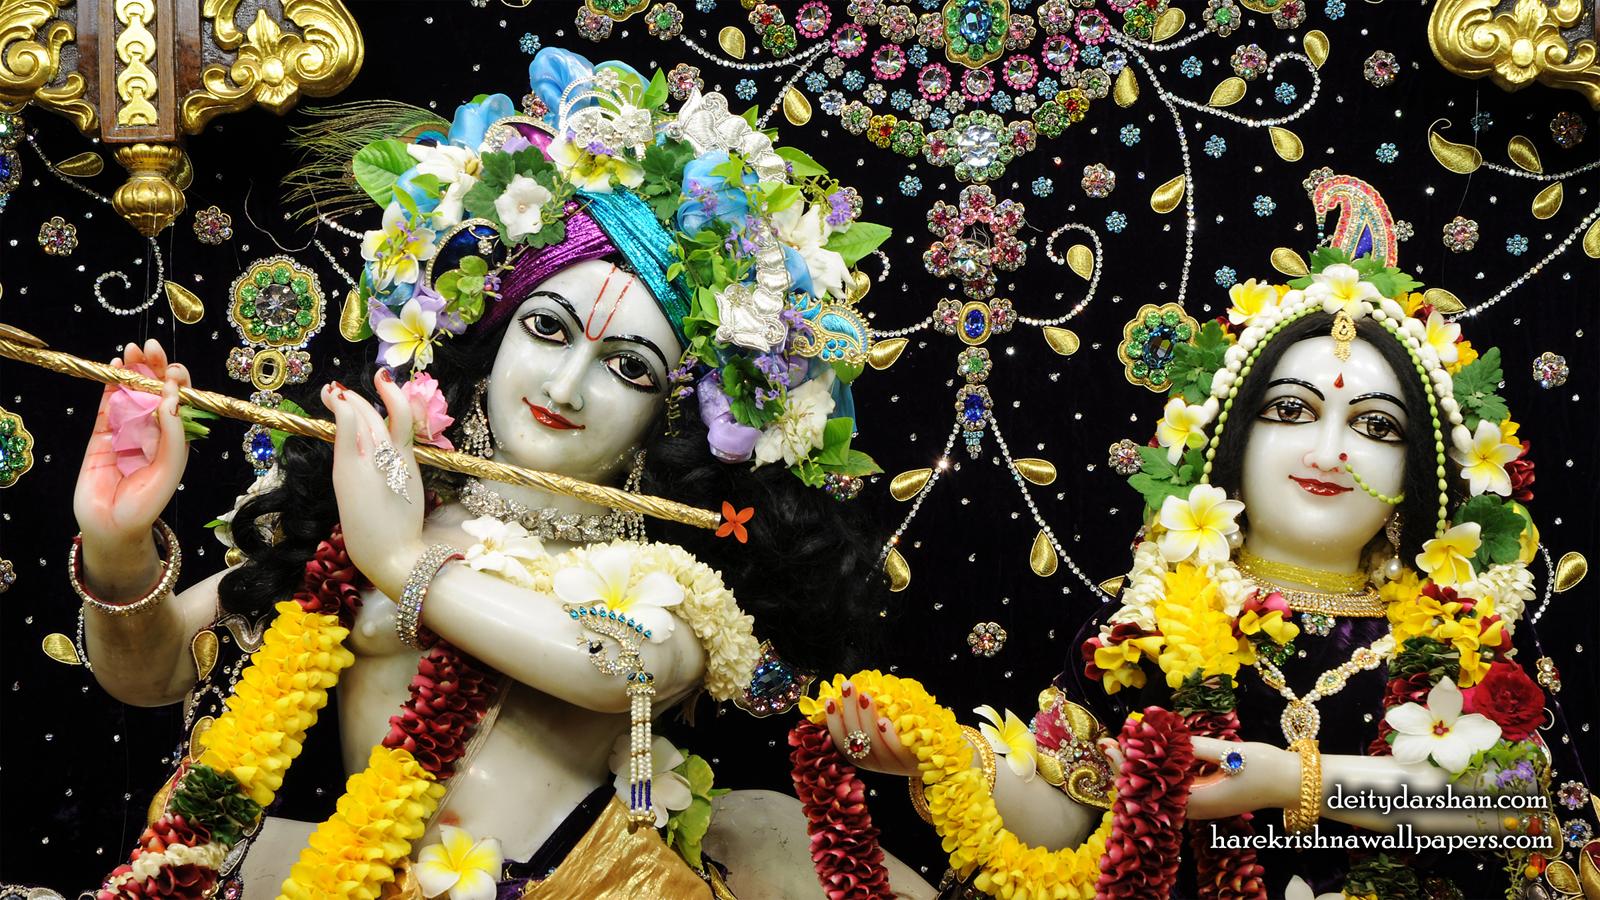 Sri Sri Radha Gopinath Close up Wallpaper (067) Size 1600x900 Download